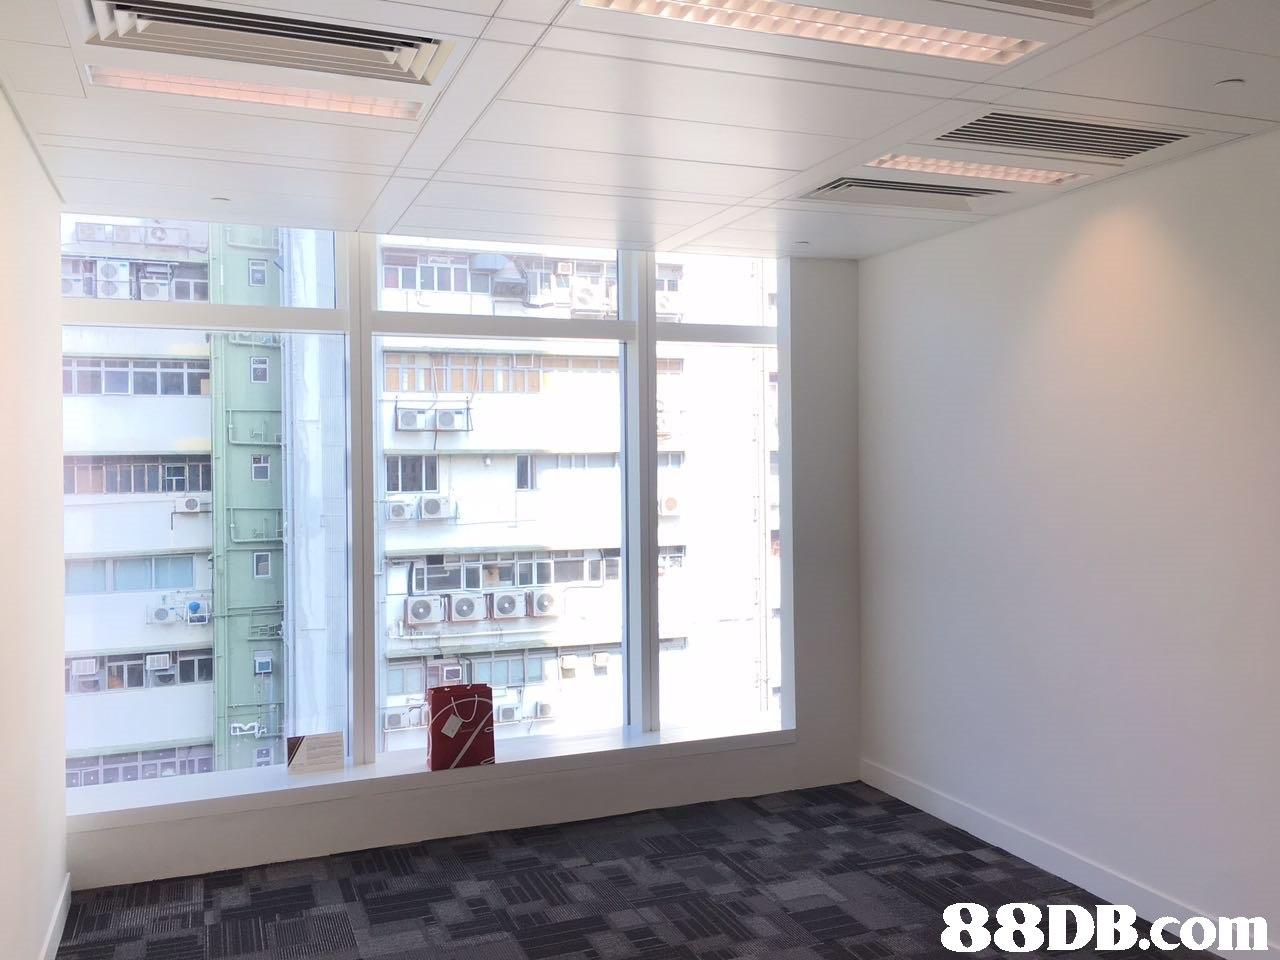 property,ceiling,glass,window,interior design